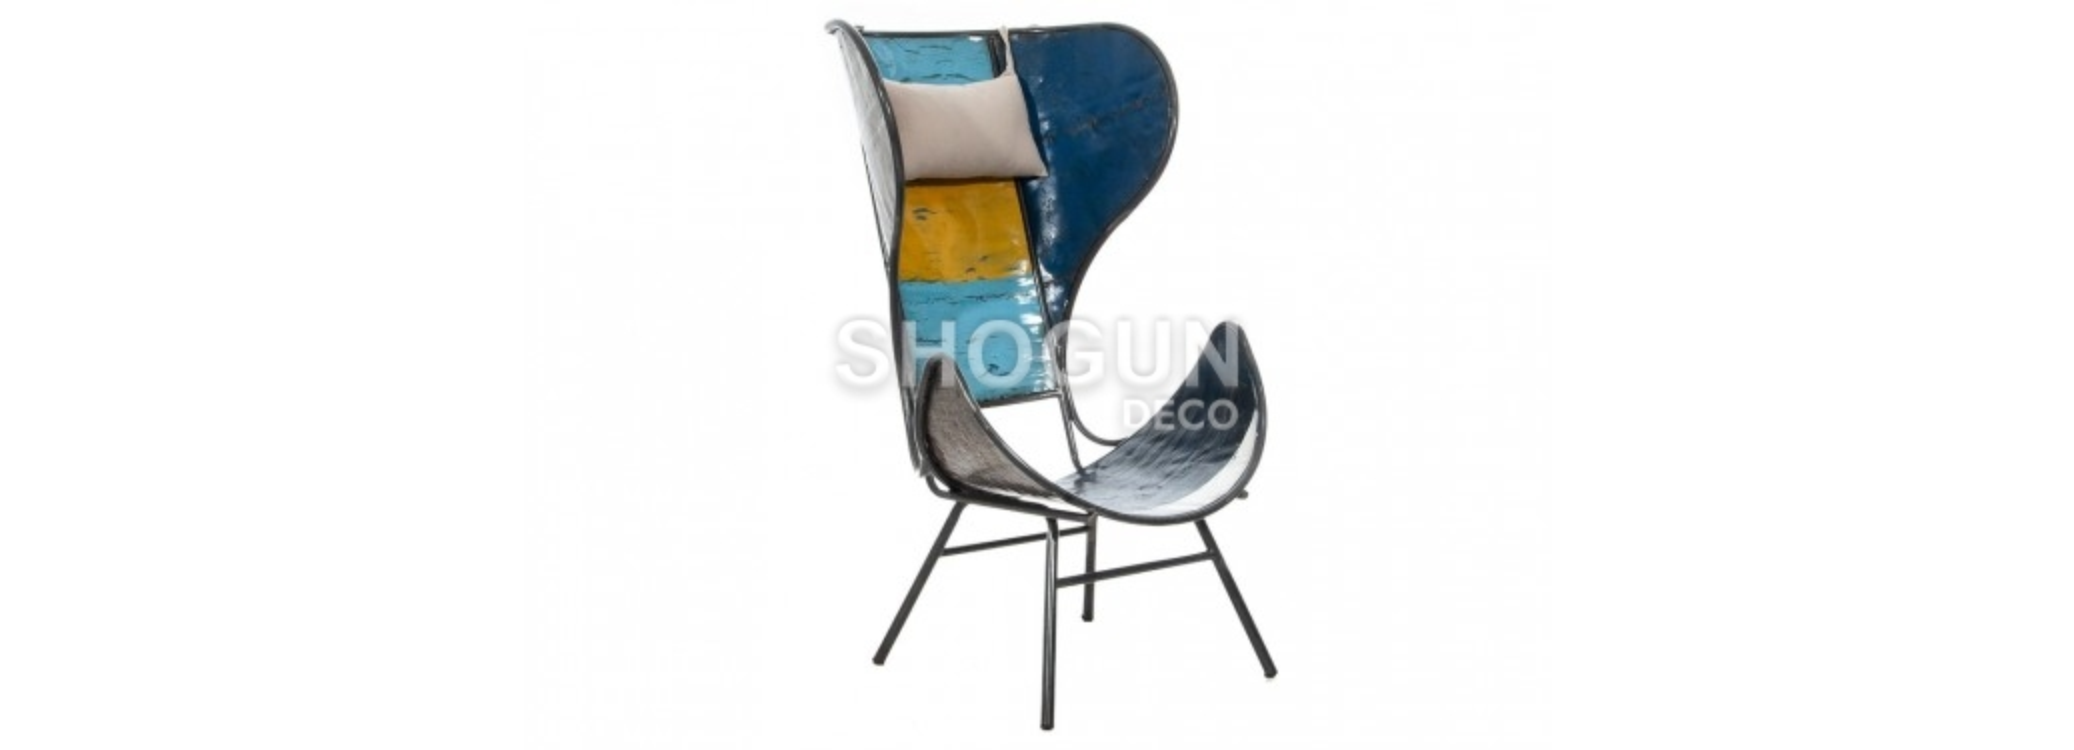 Fauteuil lounge en bidon recyclé - artisanat